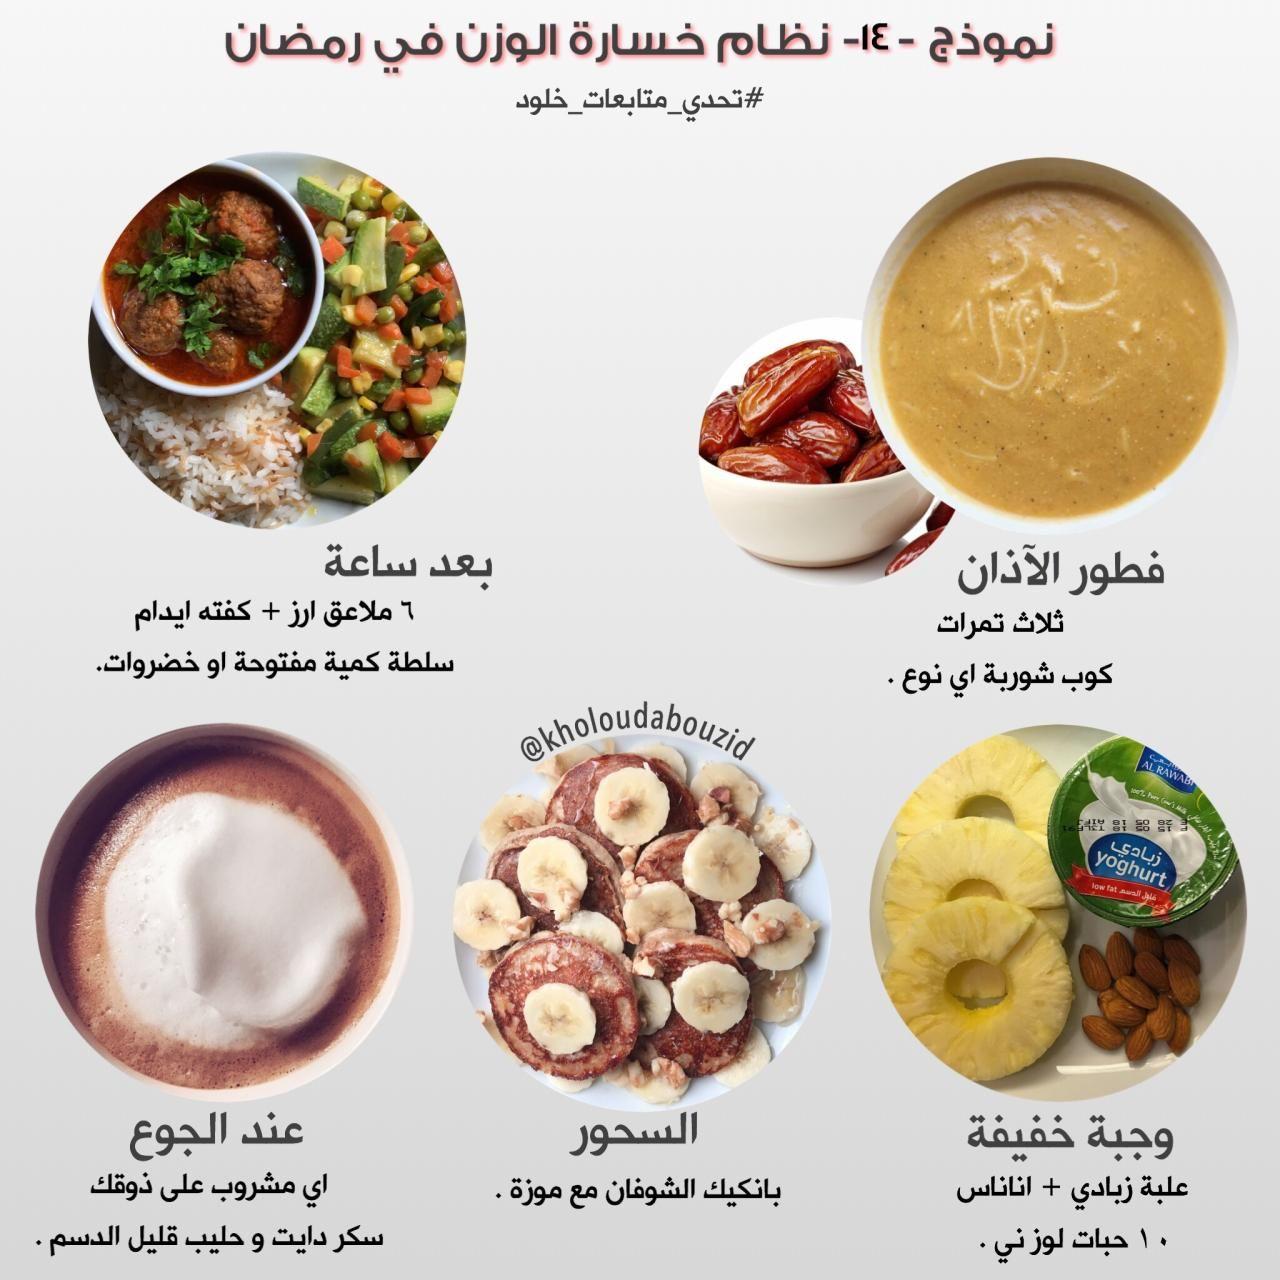 نموذج لرجيم رمضان In 2021 Health Facts Food Health Fitness Food Health Fitness Nutrition